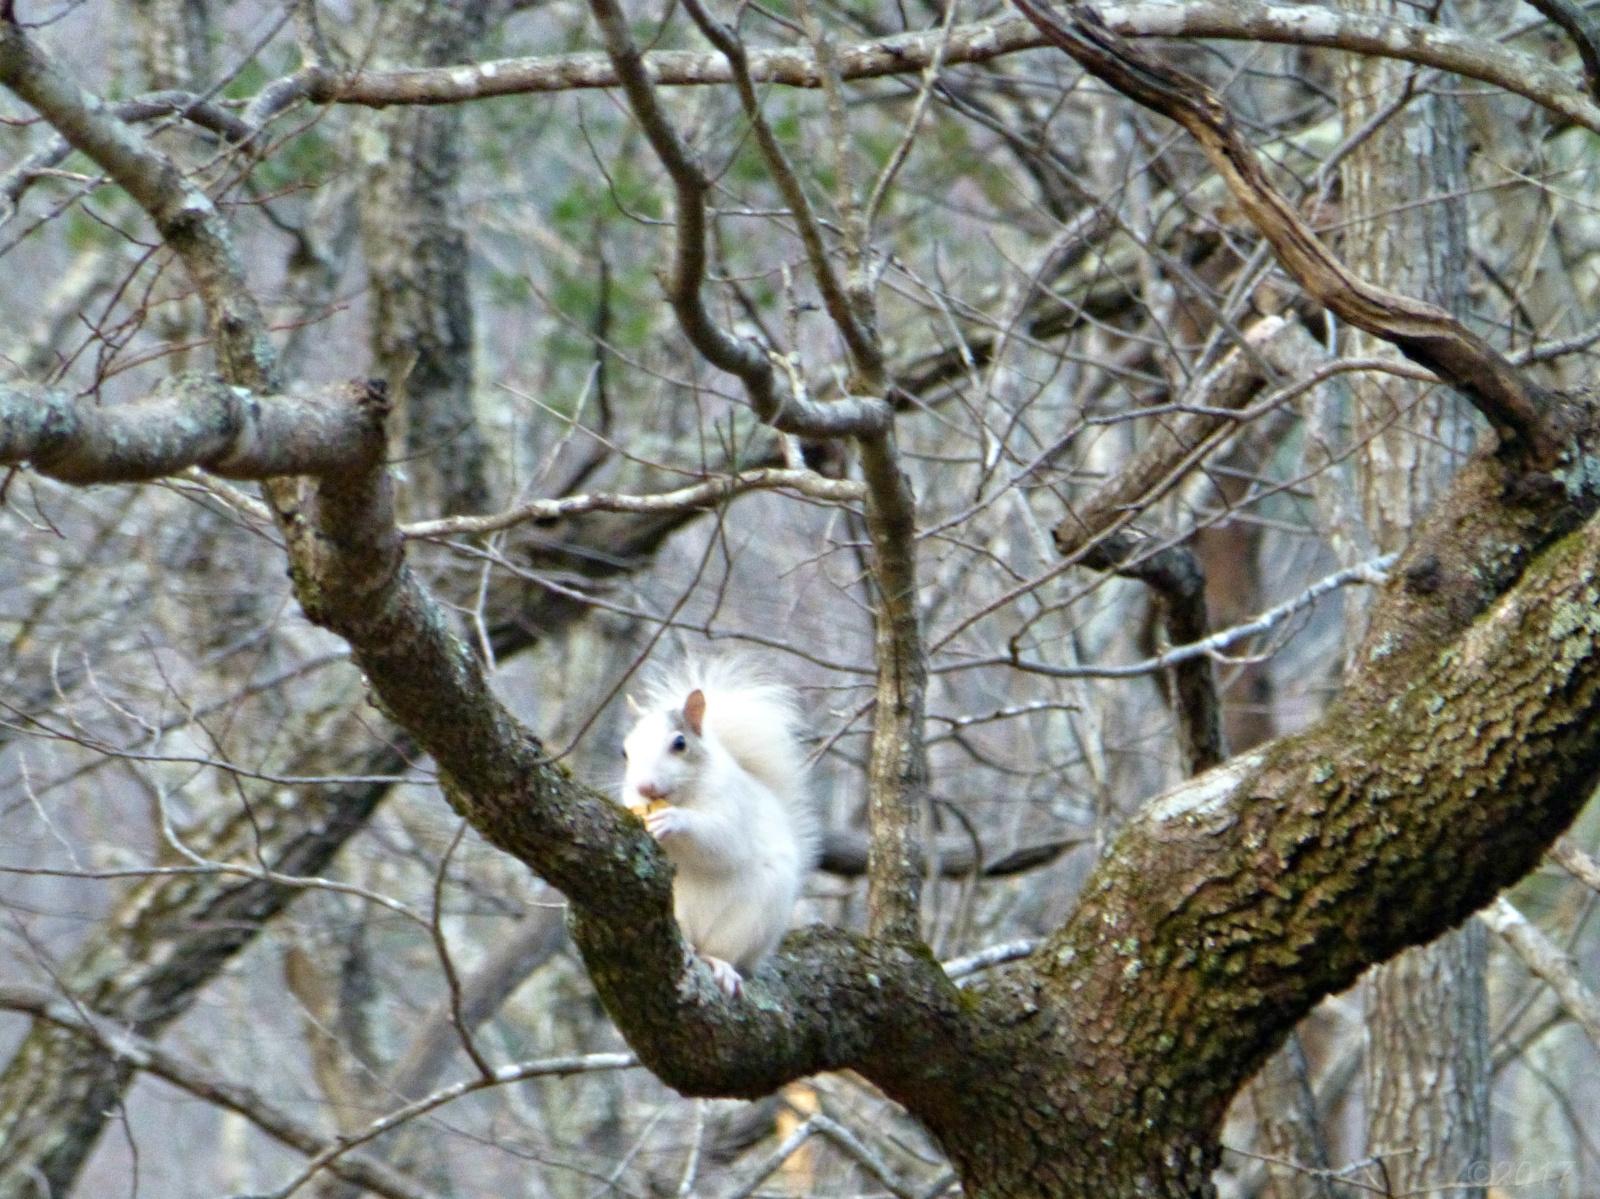 December 21, 2017 - White squirrel in Bent Tree